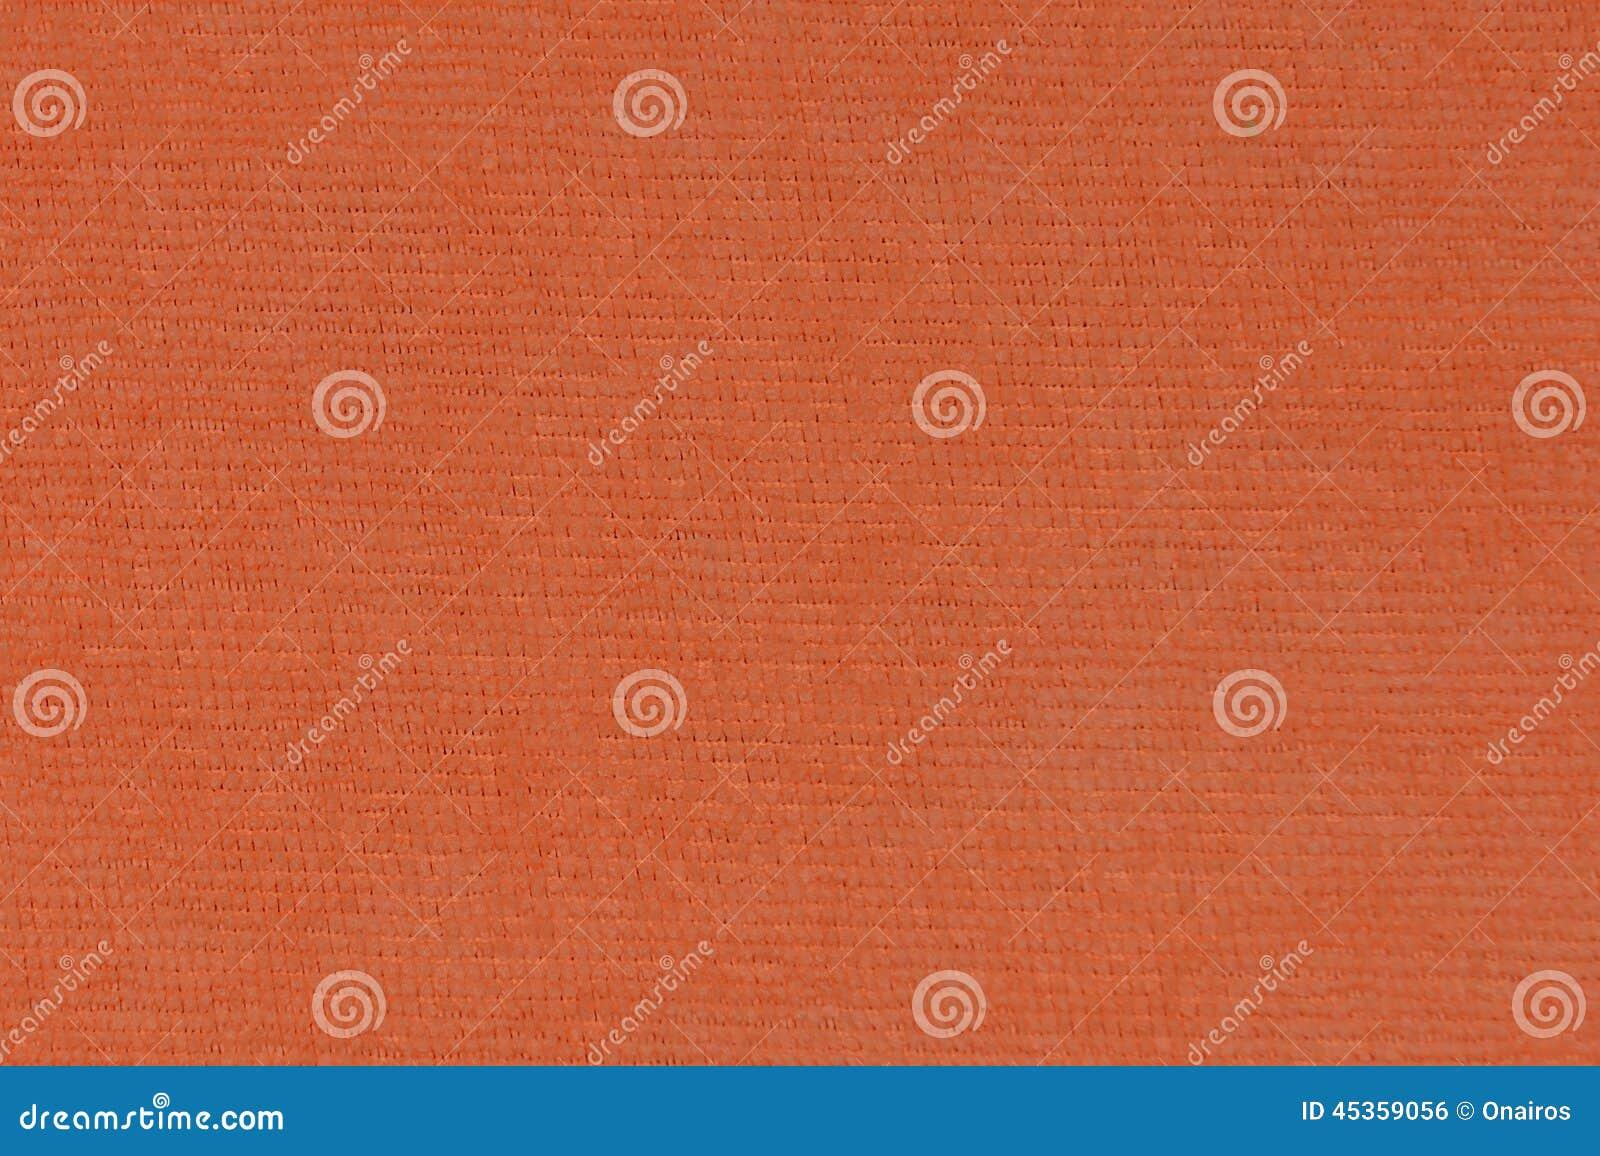 Texture orange de tissu